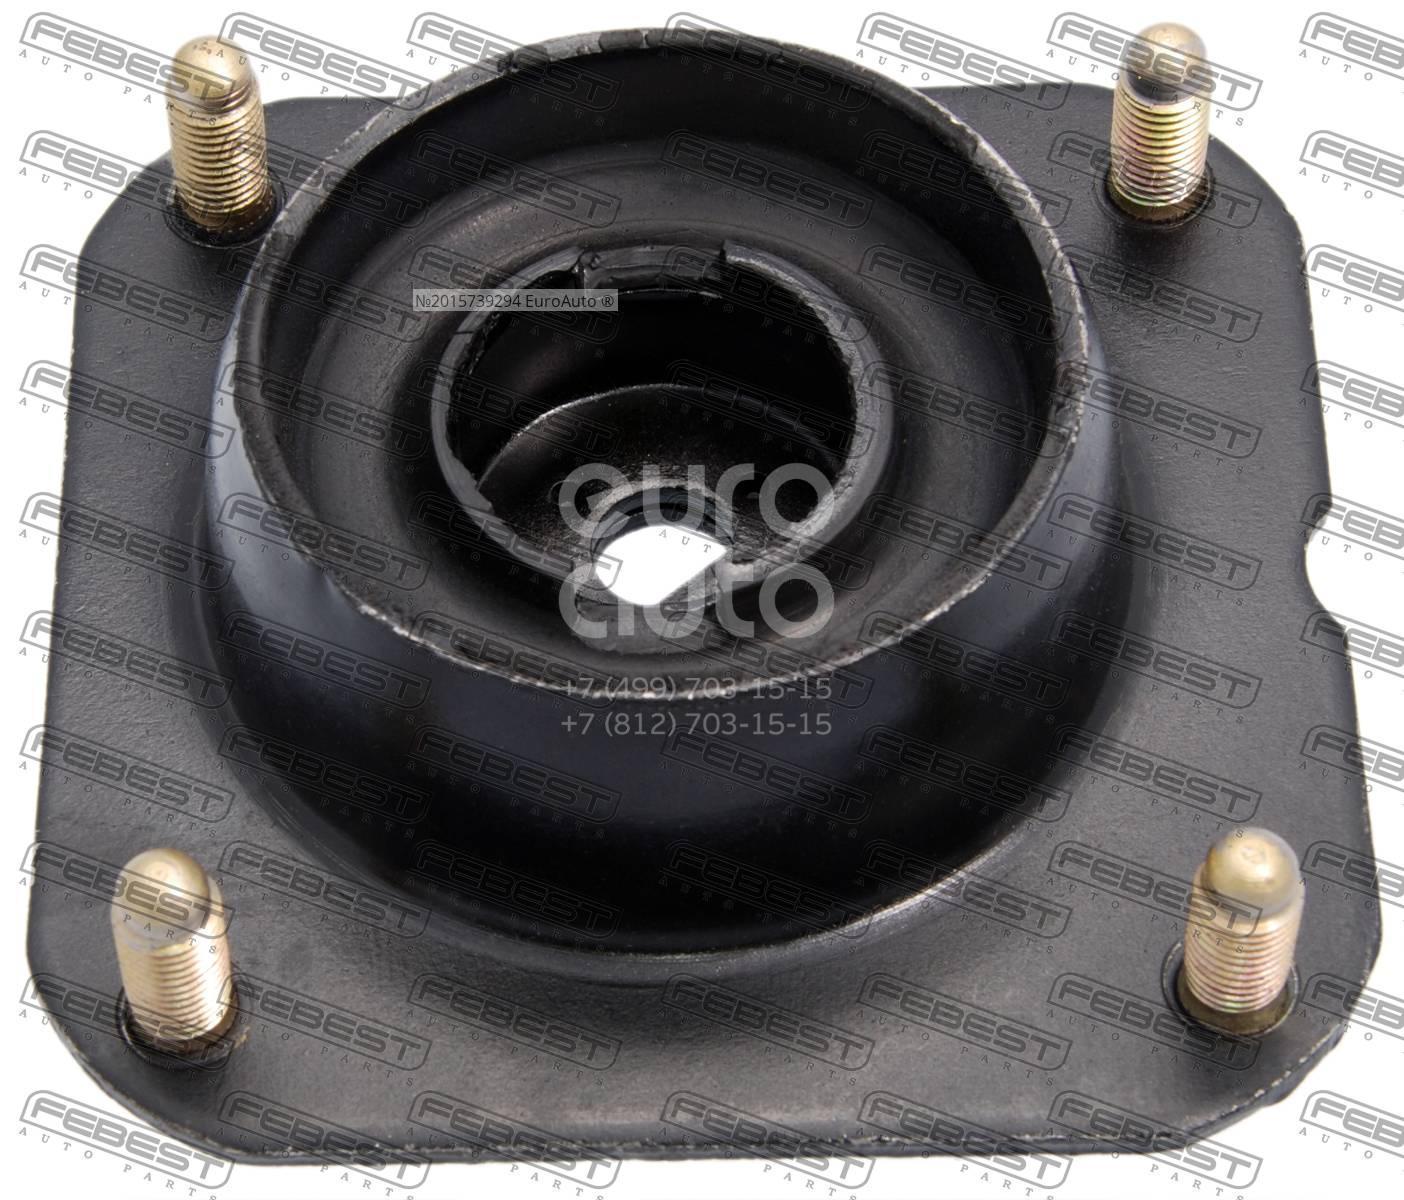 Купить Опора переднего амортизатора верхняя Mazda 626 (GF) 1997-2002; (MZSS-019)